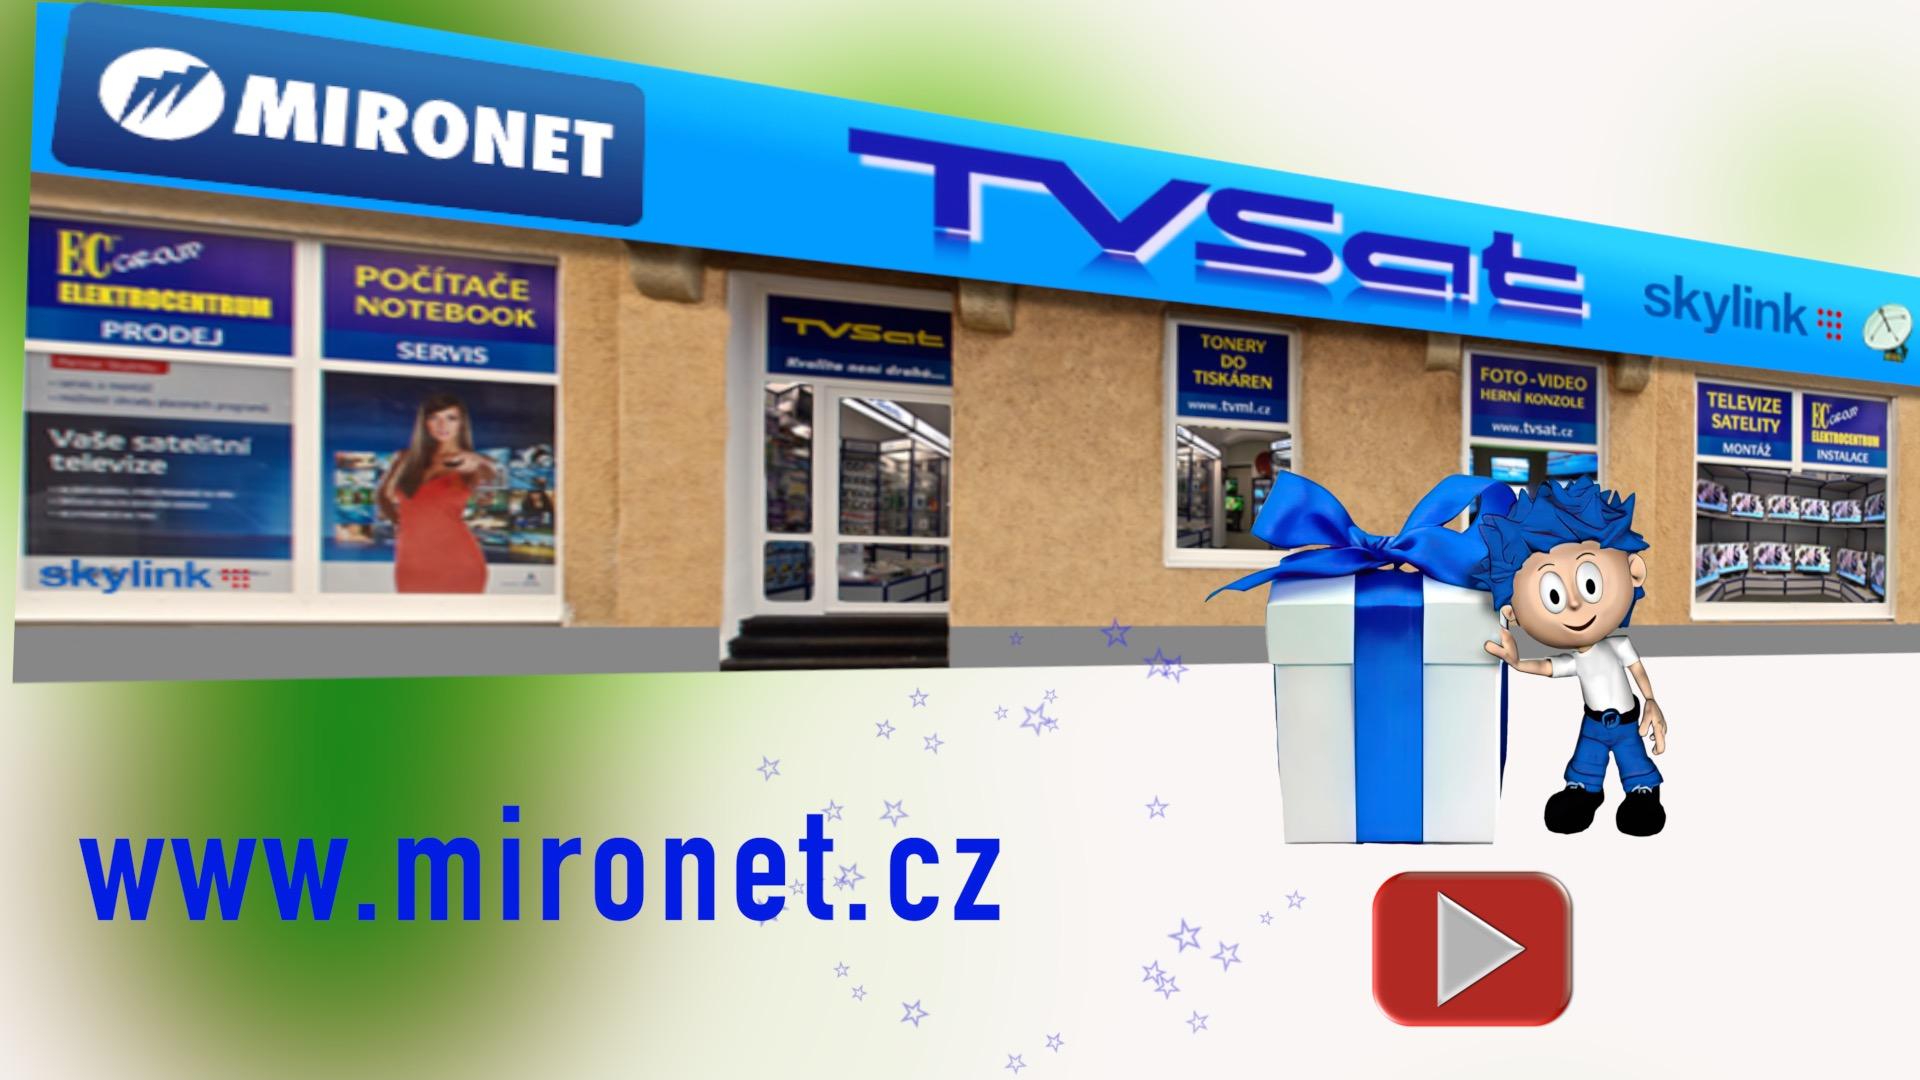 mironet_web